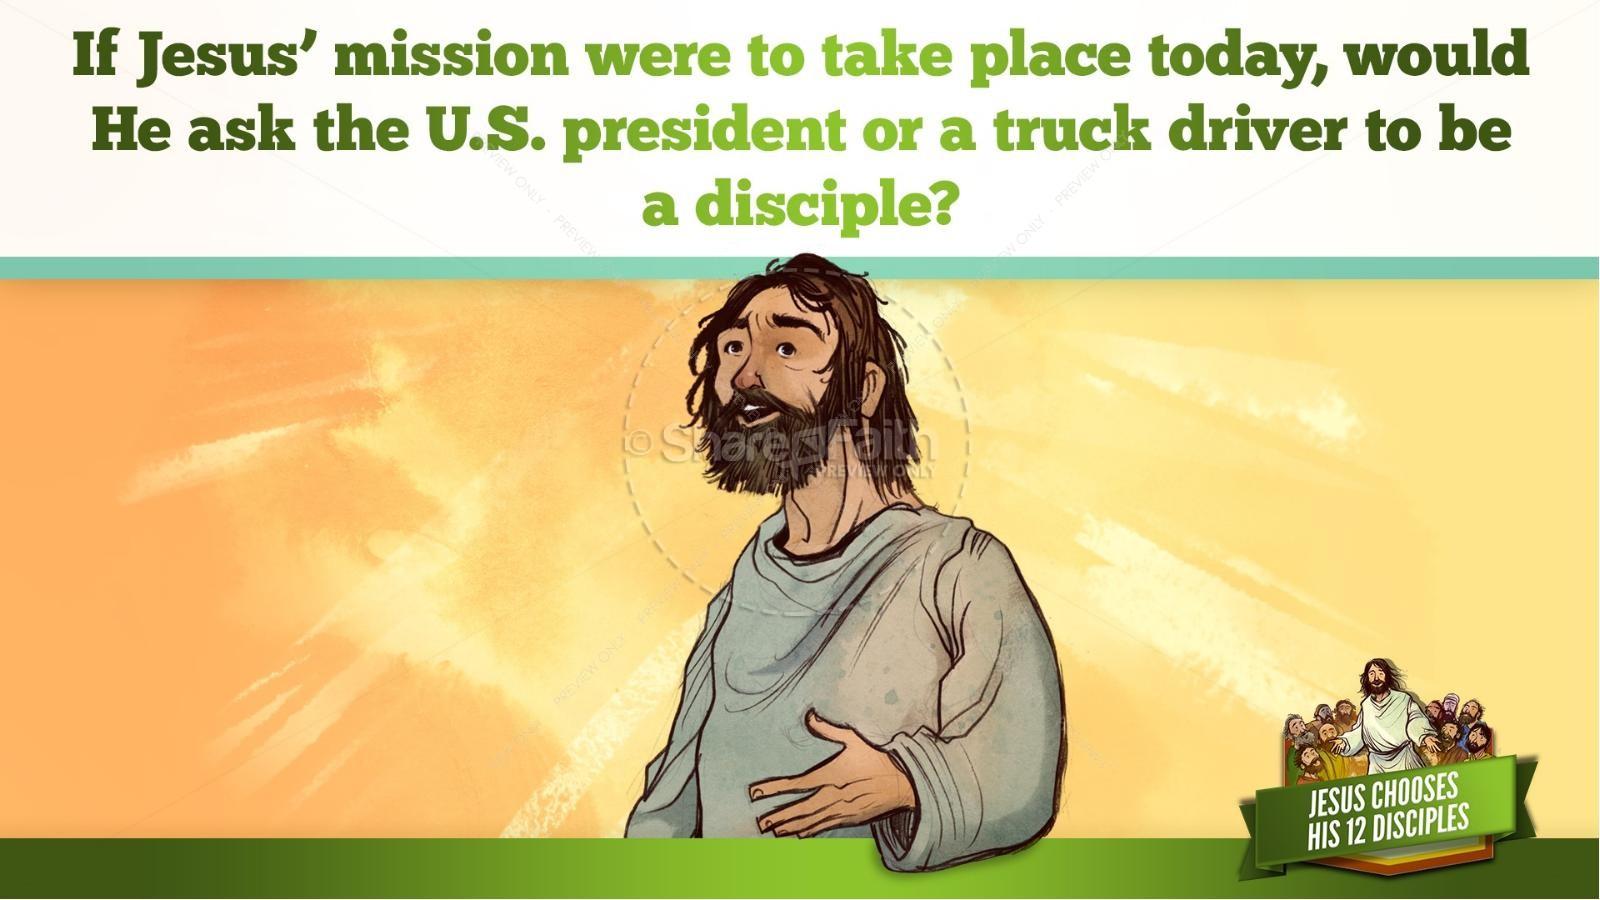 Jesus Chooses His 12 Disciples Kids Bible Story | slide 28